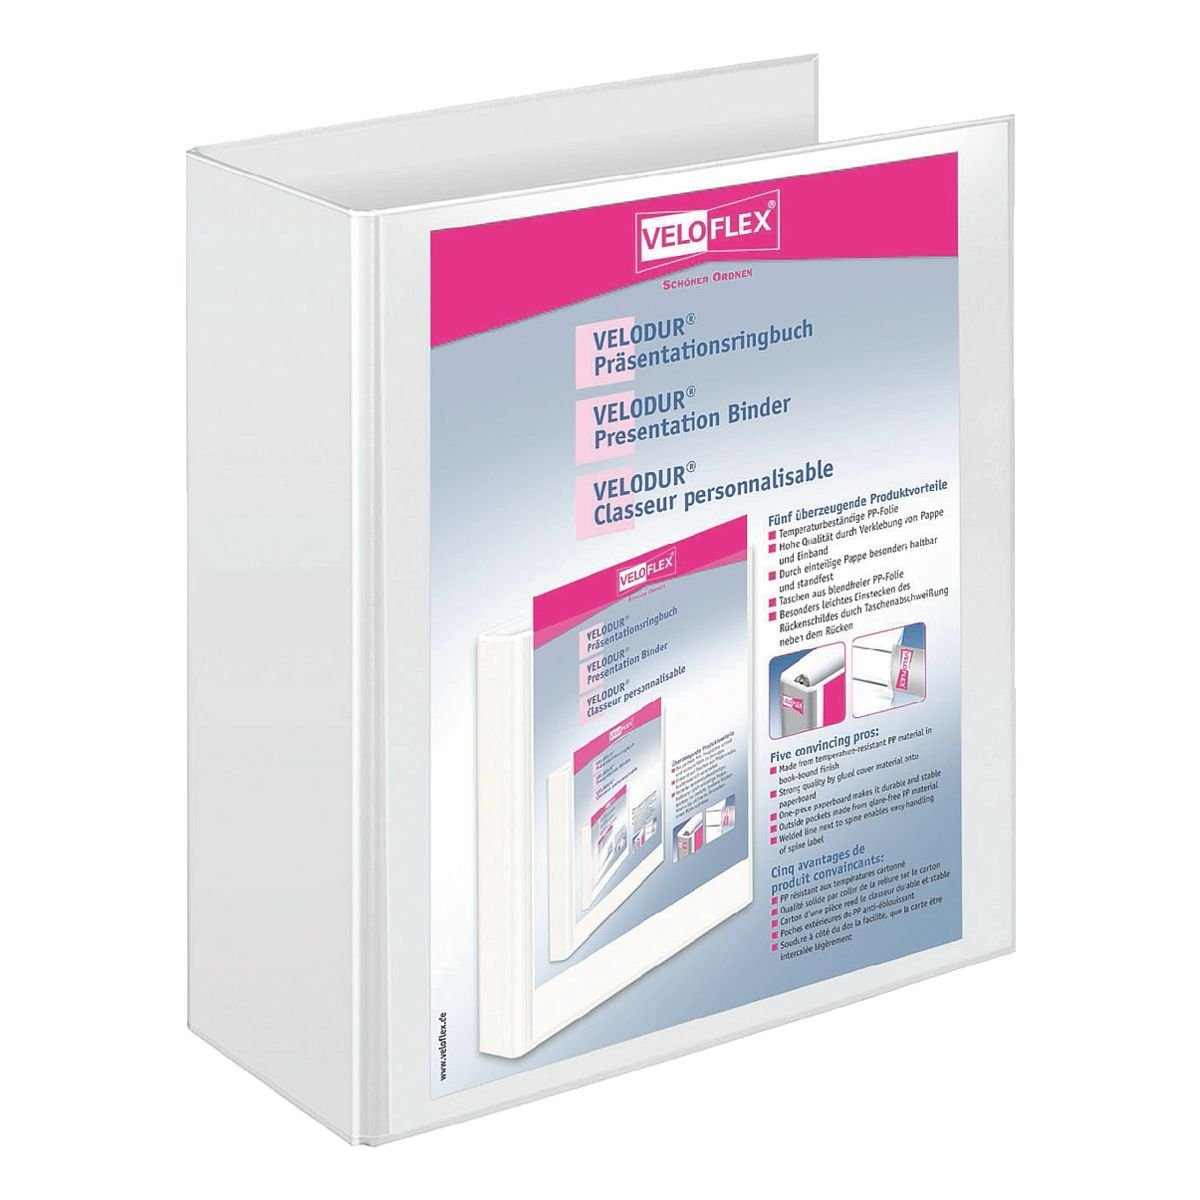 Veloflex Präsentationsringbuch »Velodur«